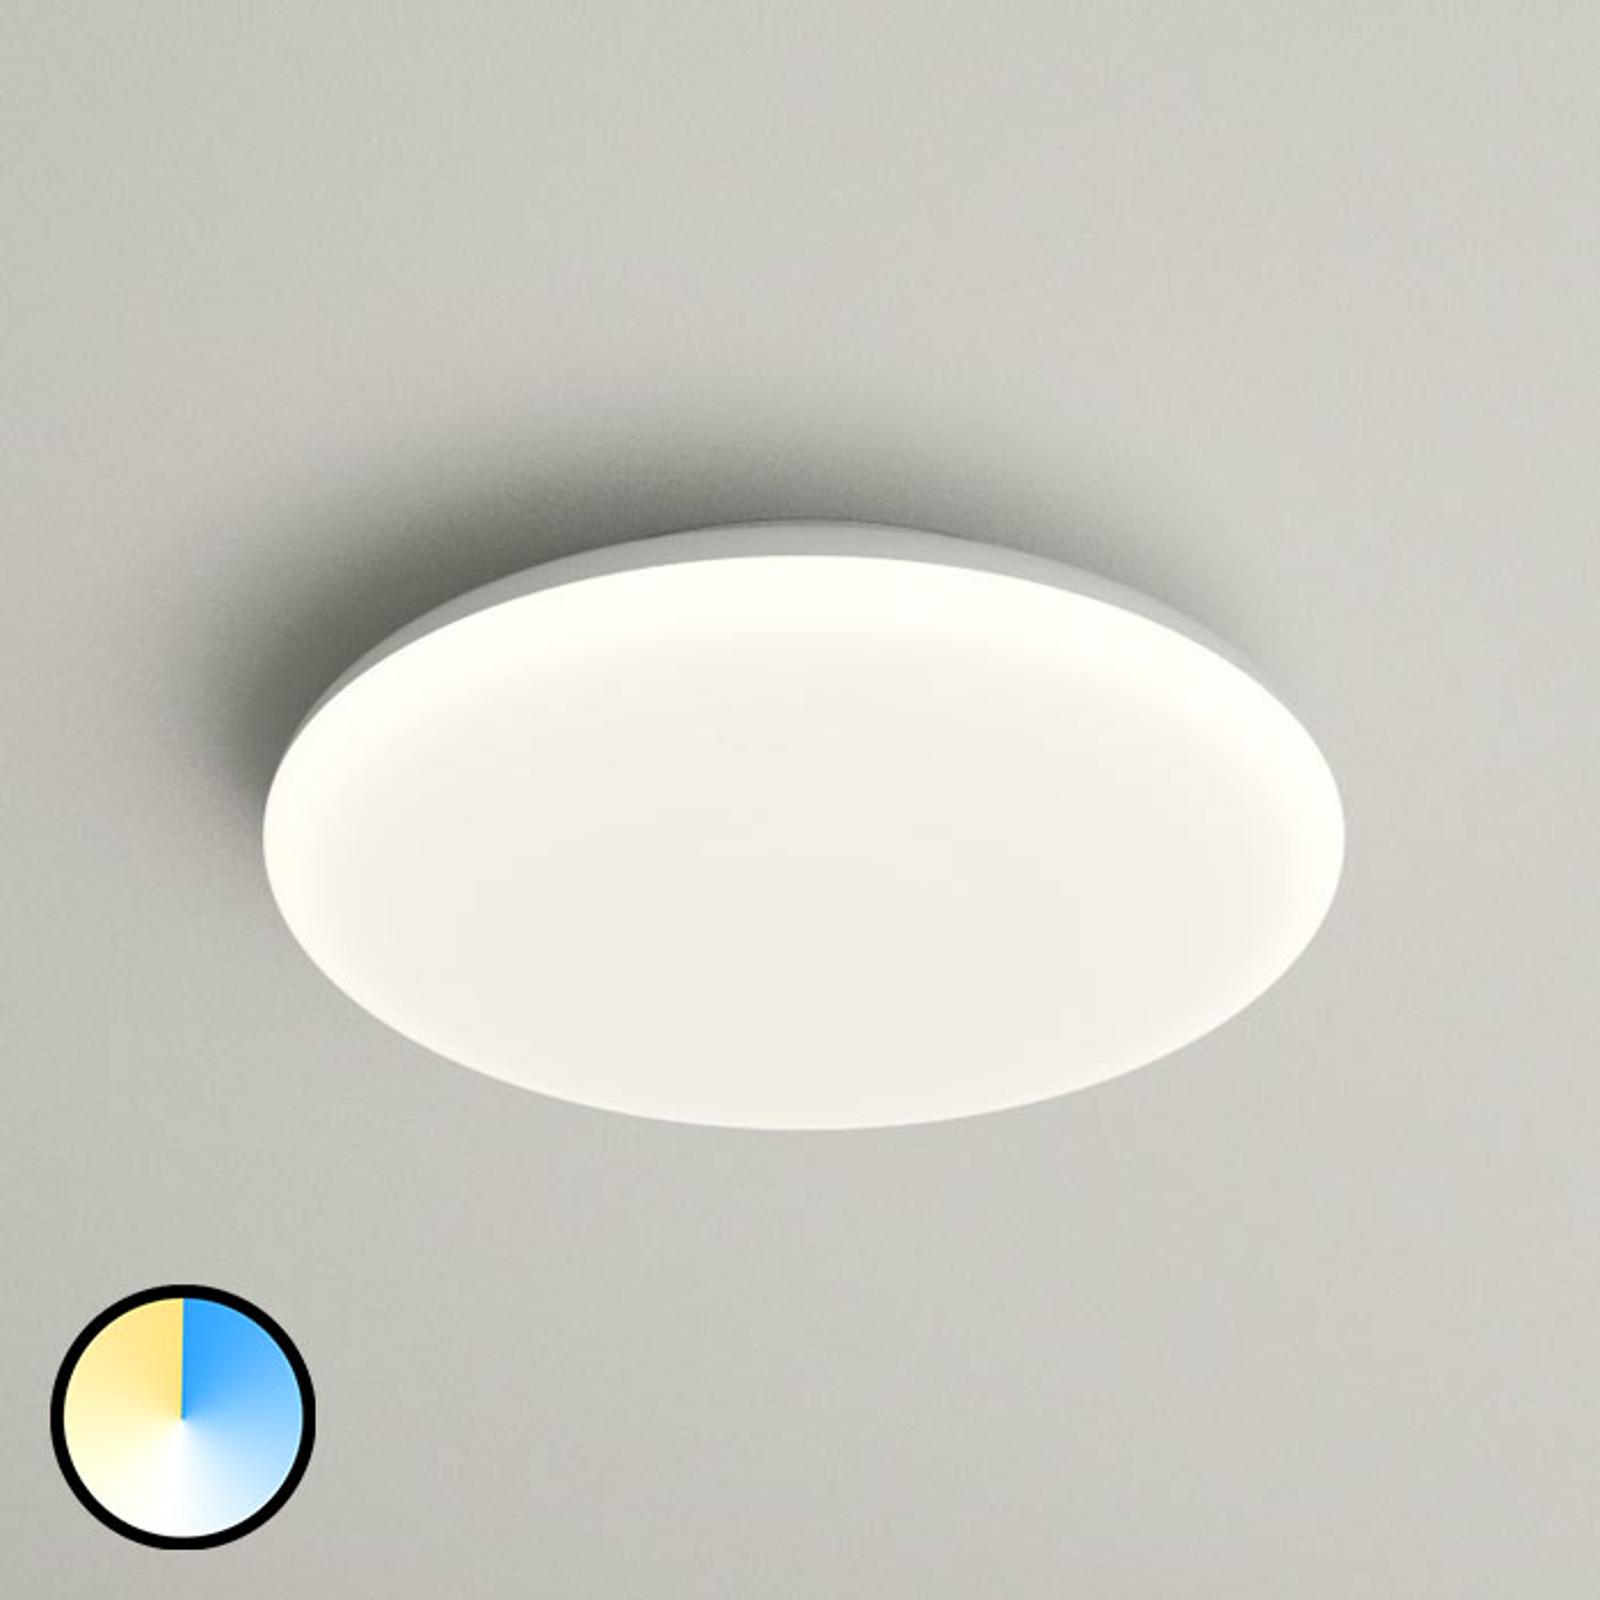 LED plafondlamp Azra, wit, rond, IP54, Ø 25 cm